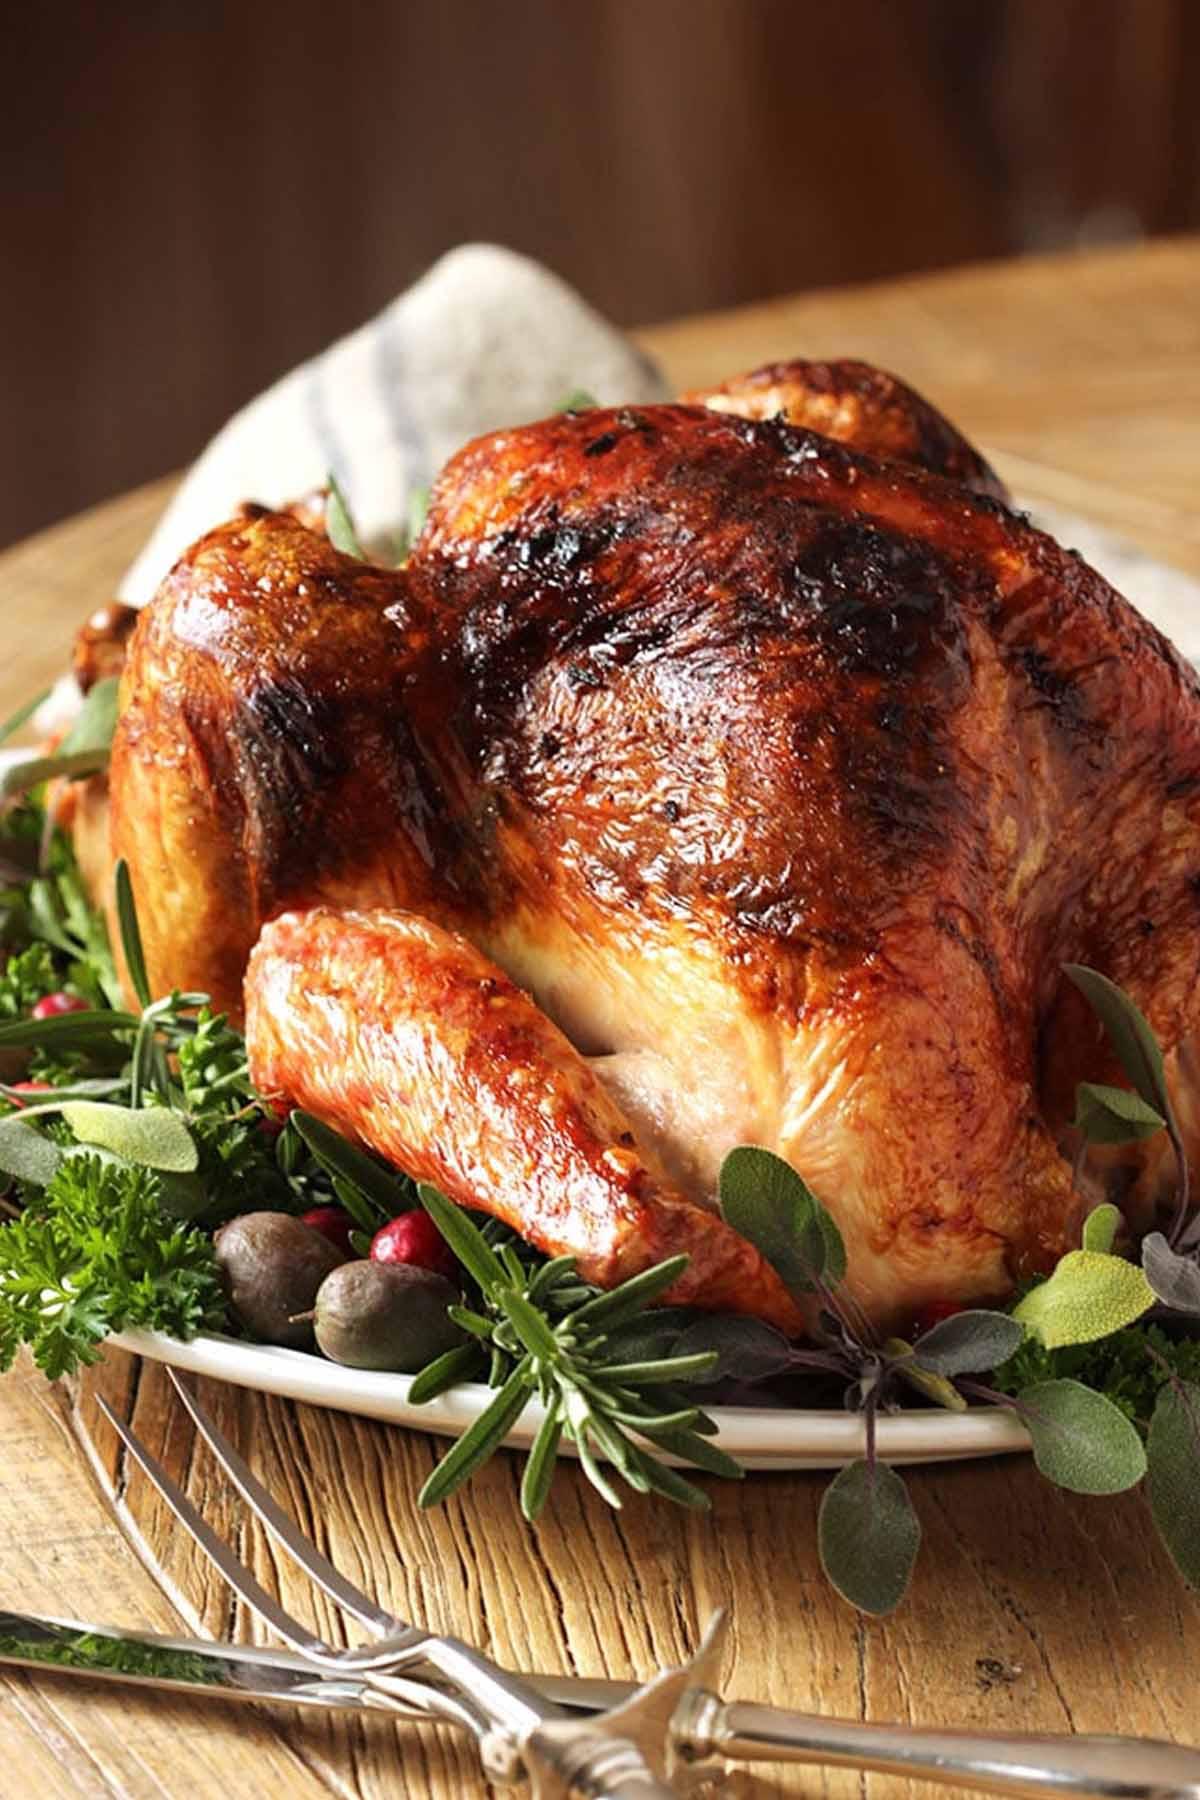 Turkey Picture For Thanksgiving  19 Best Thanksgiving Turkey Recipes Easy Roast Turkey